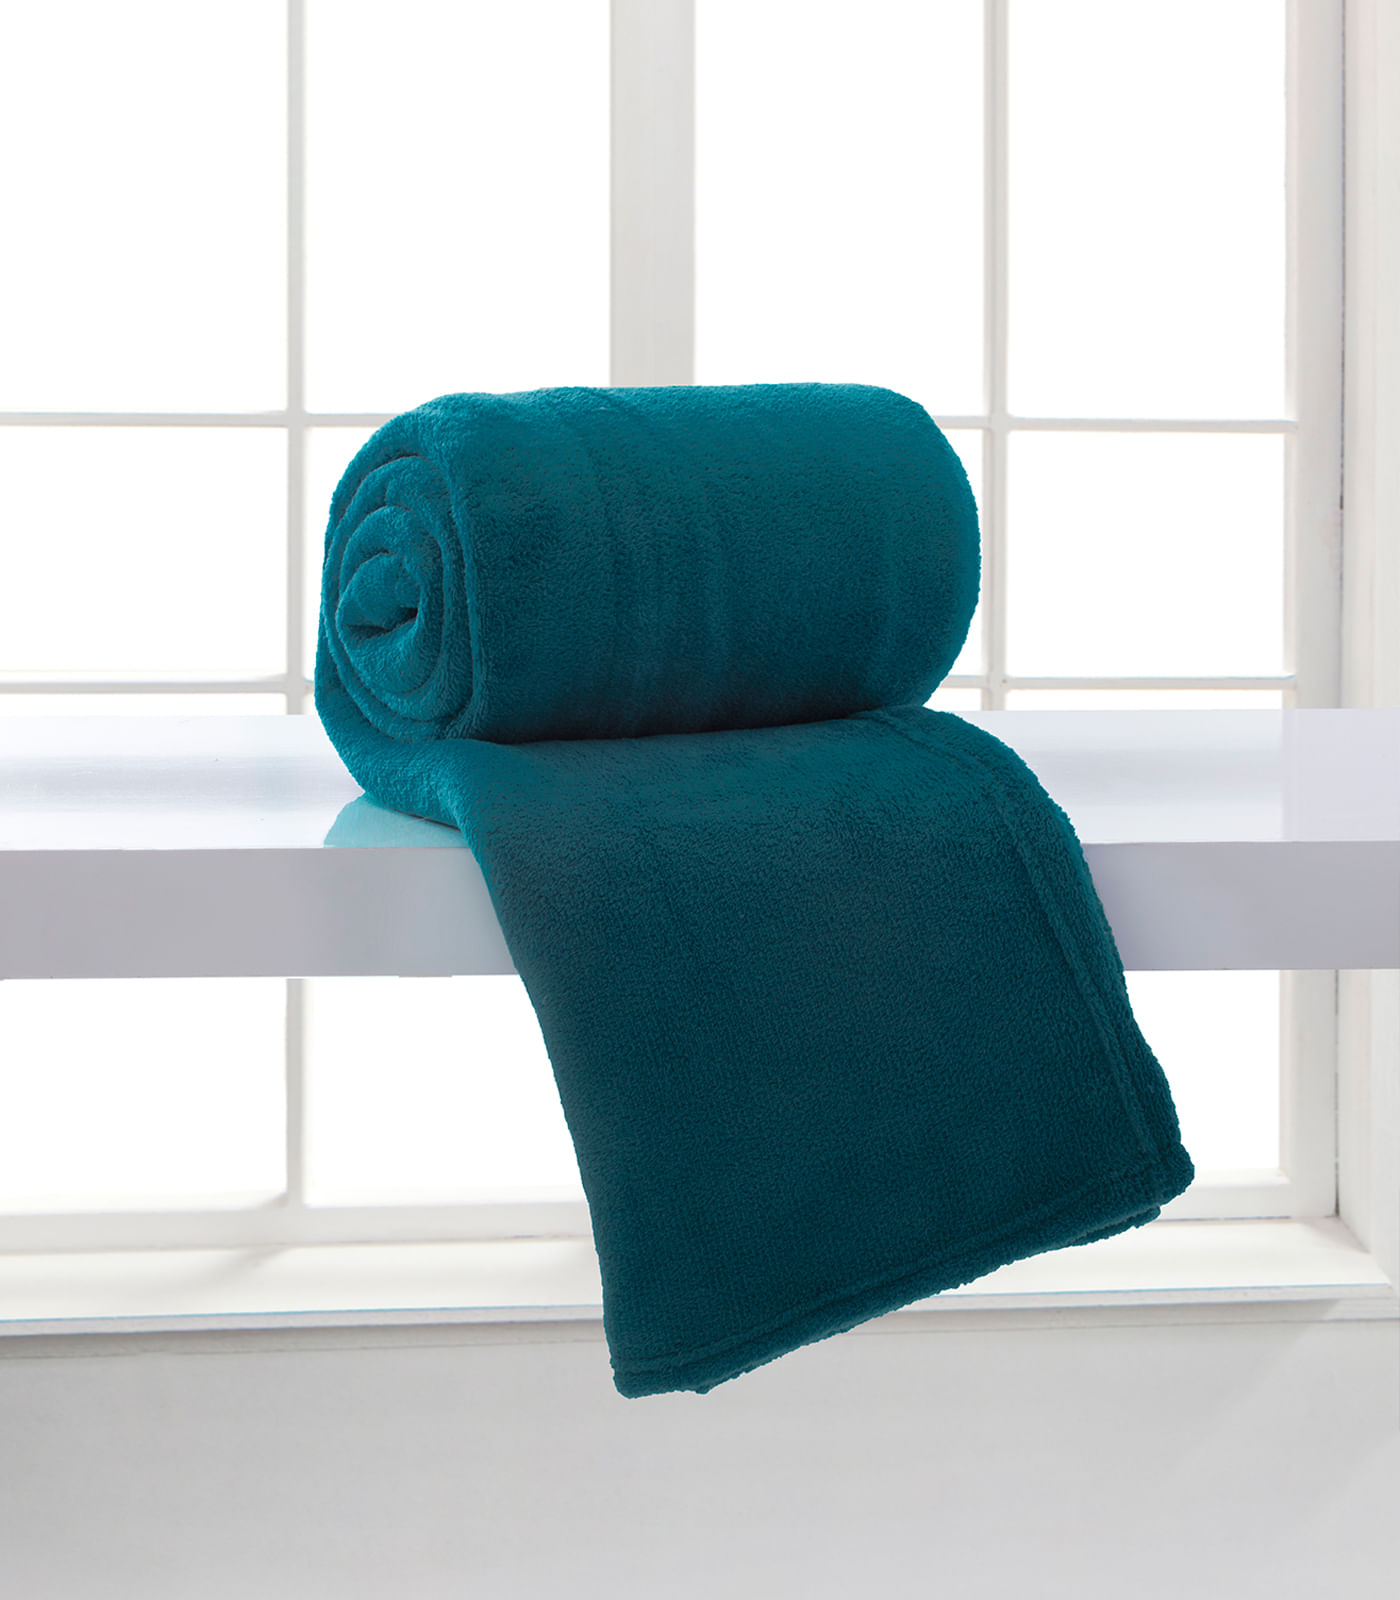 Manta-King-de-Microfibra-Cortex-Azul